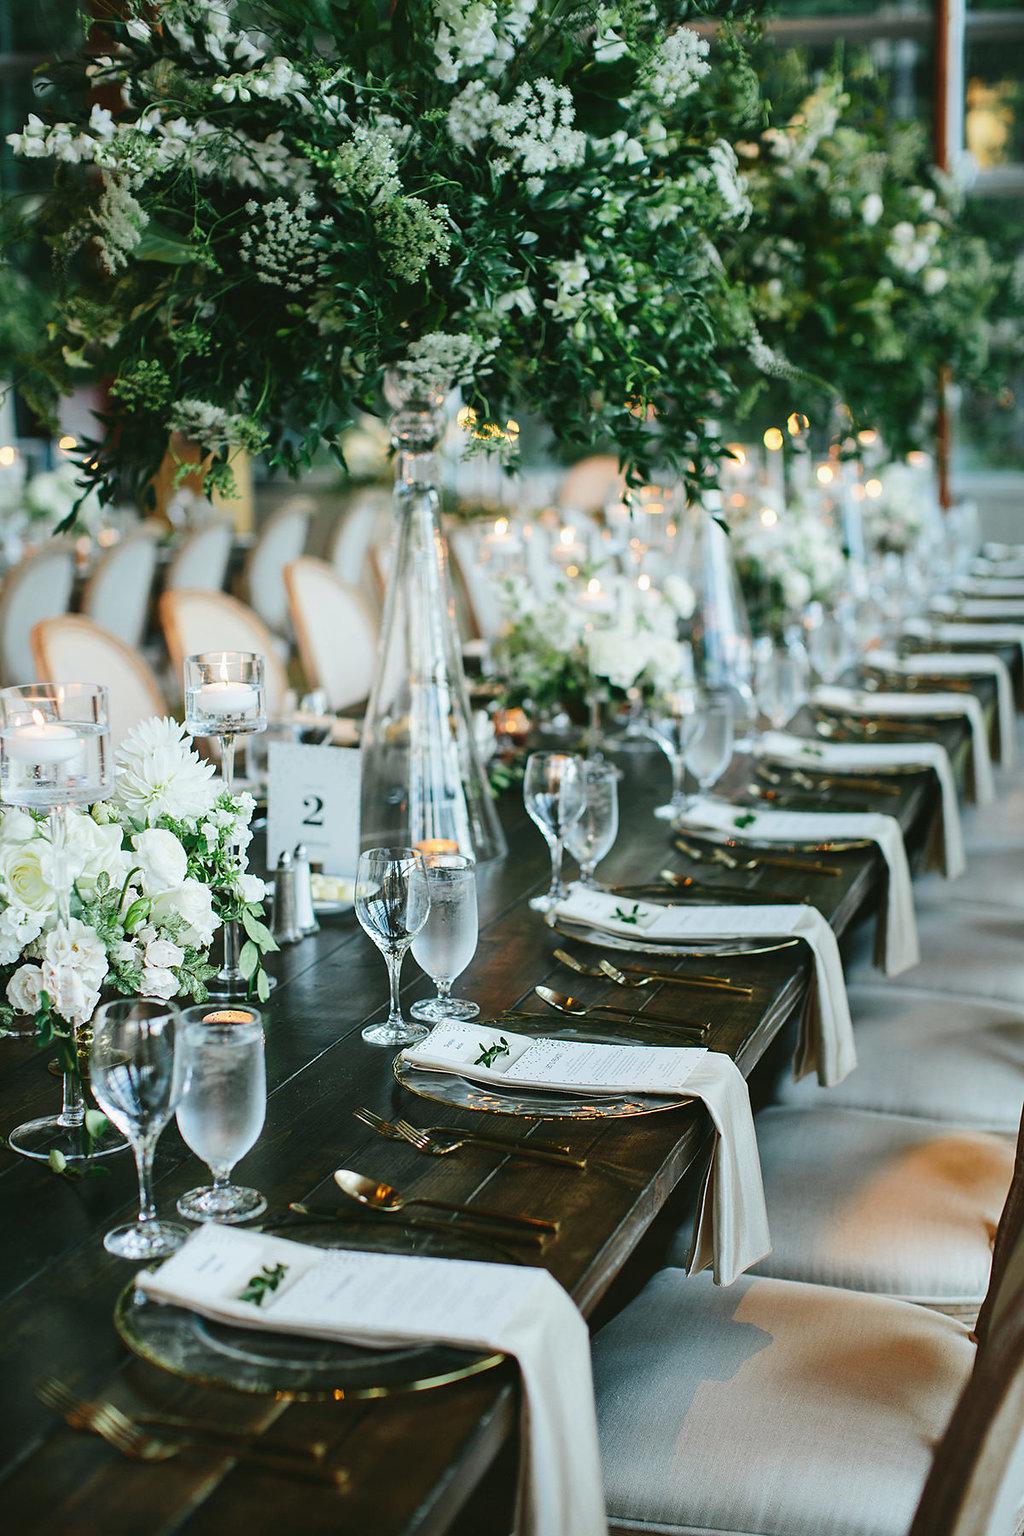 wedding tablescapes - photo by Melia Lucida https://ruffledblog.com/elegant-canadian-wedding-with-greenery